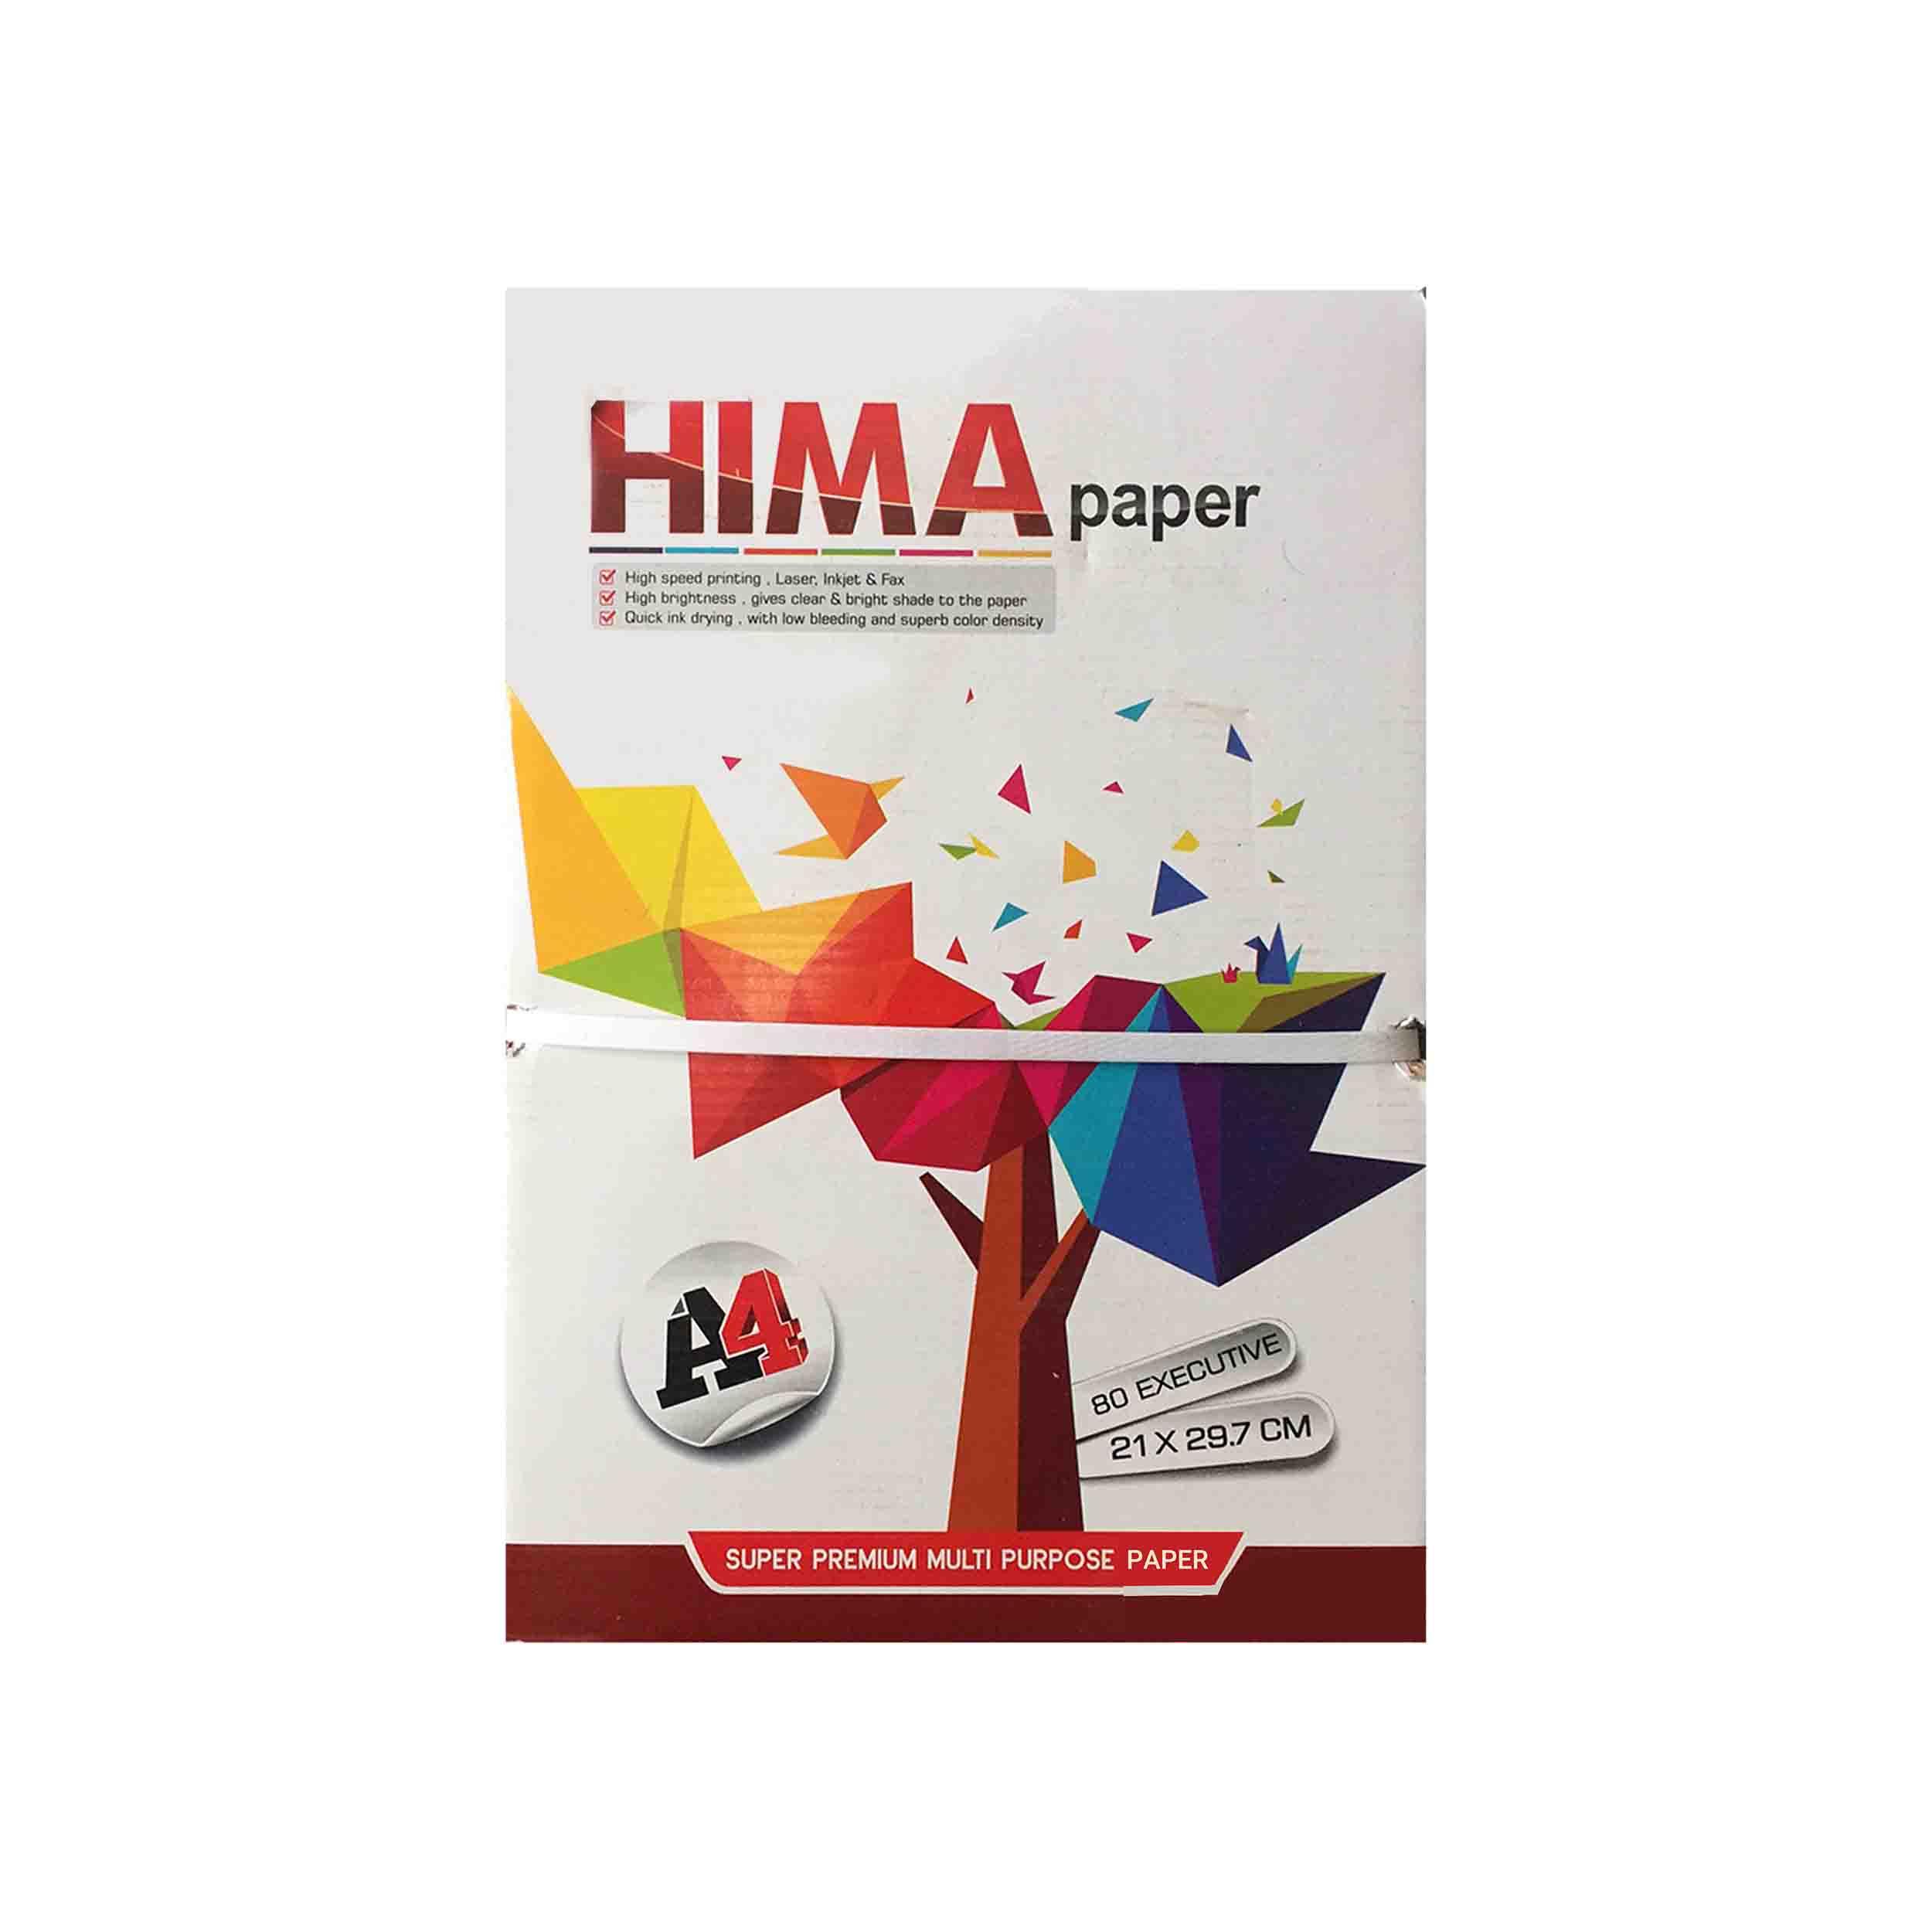 کاغذ A4 هیما کد H01 بسته 500 عددی